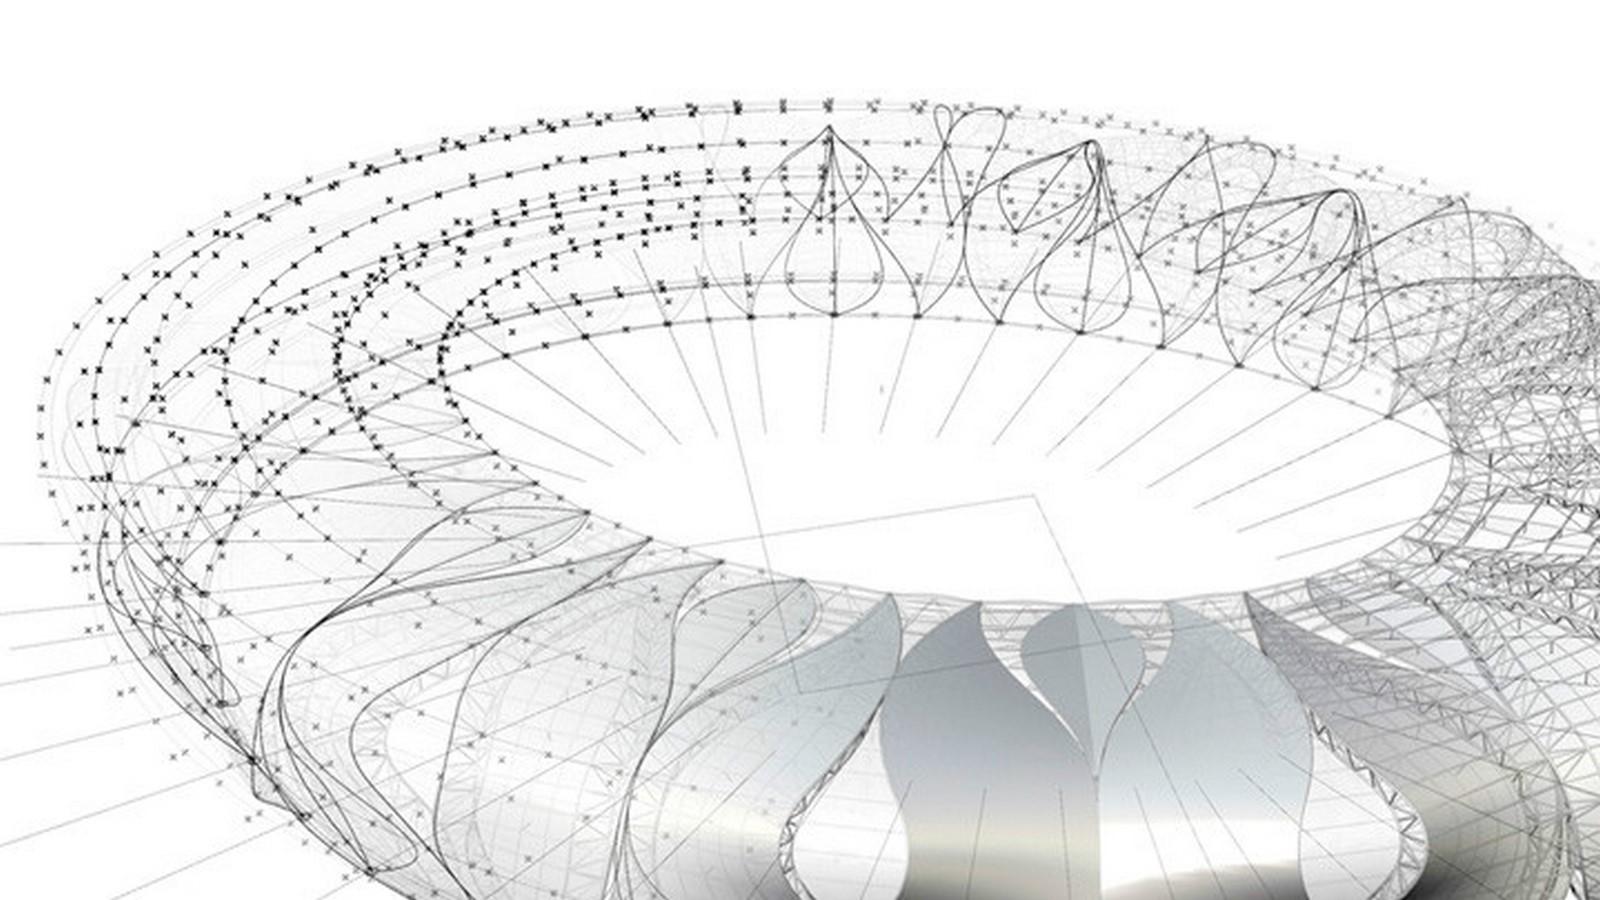 10 Architectural Online courses for parametric design- Sheet4